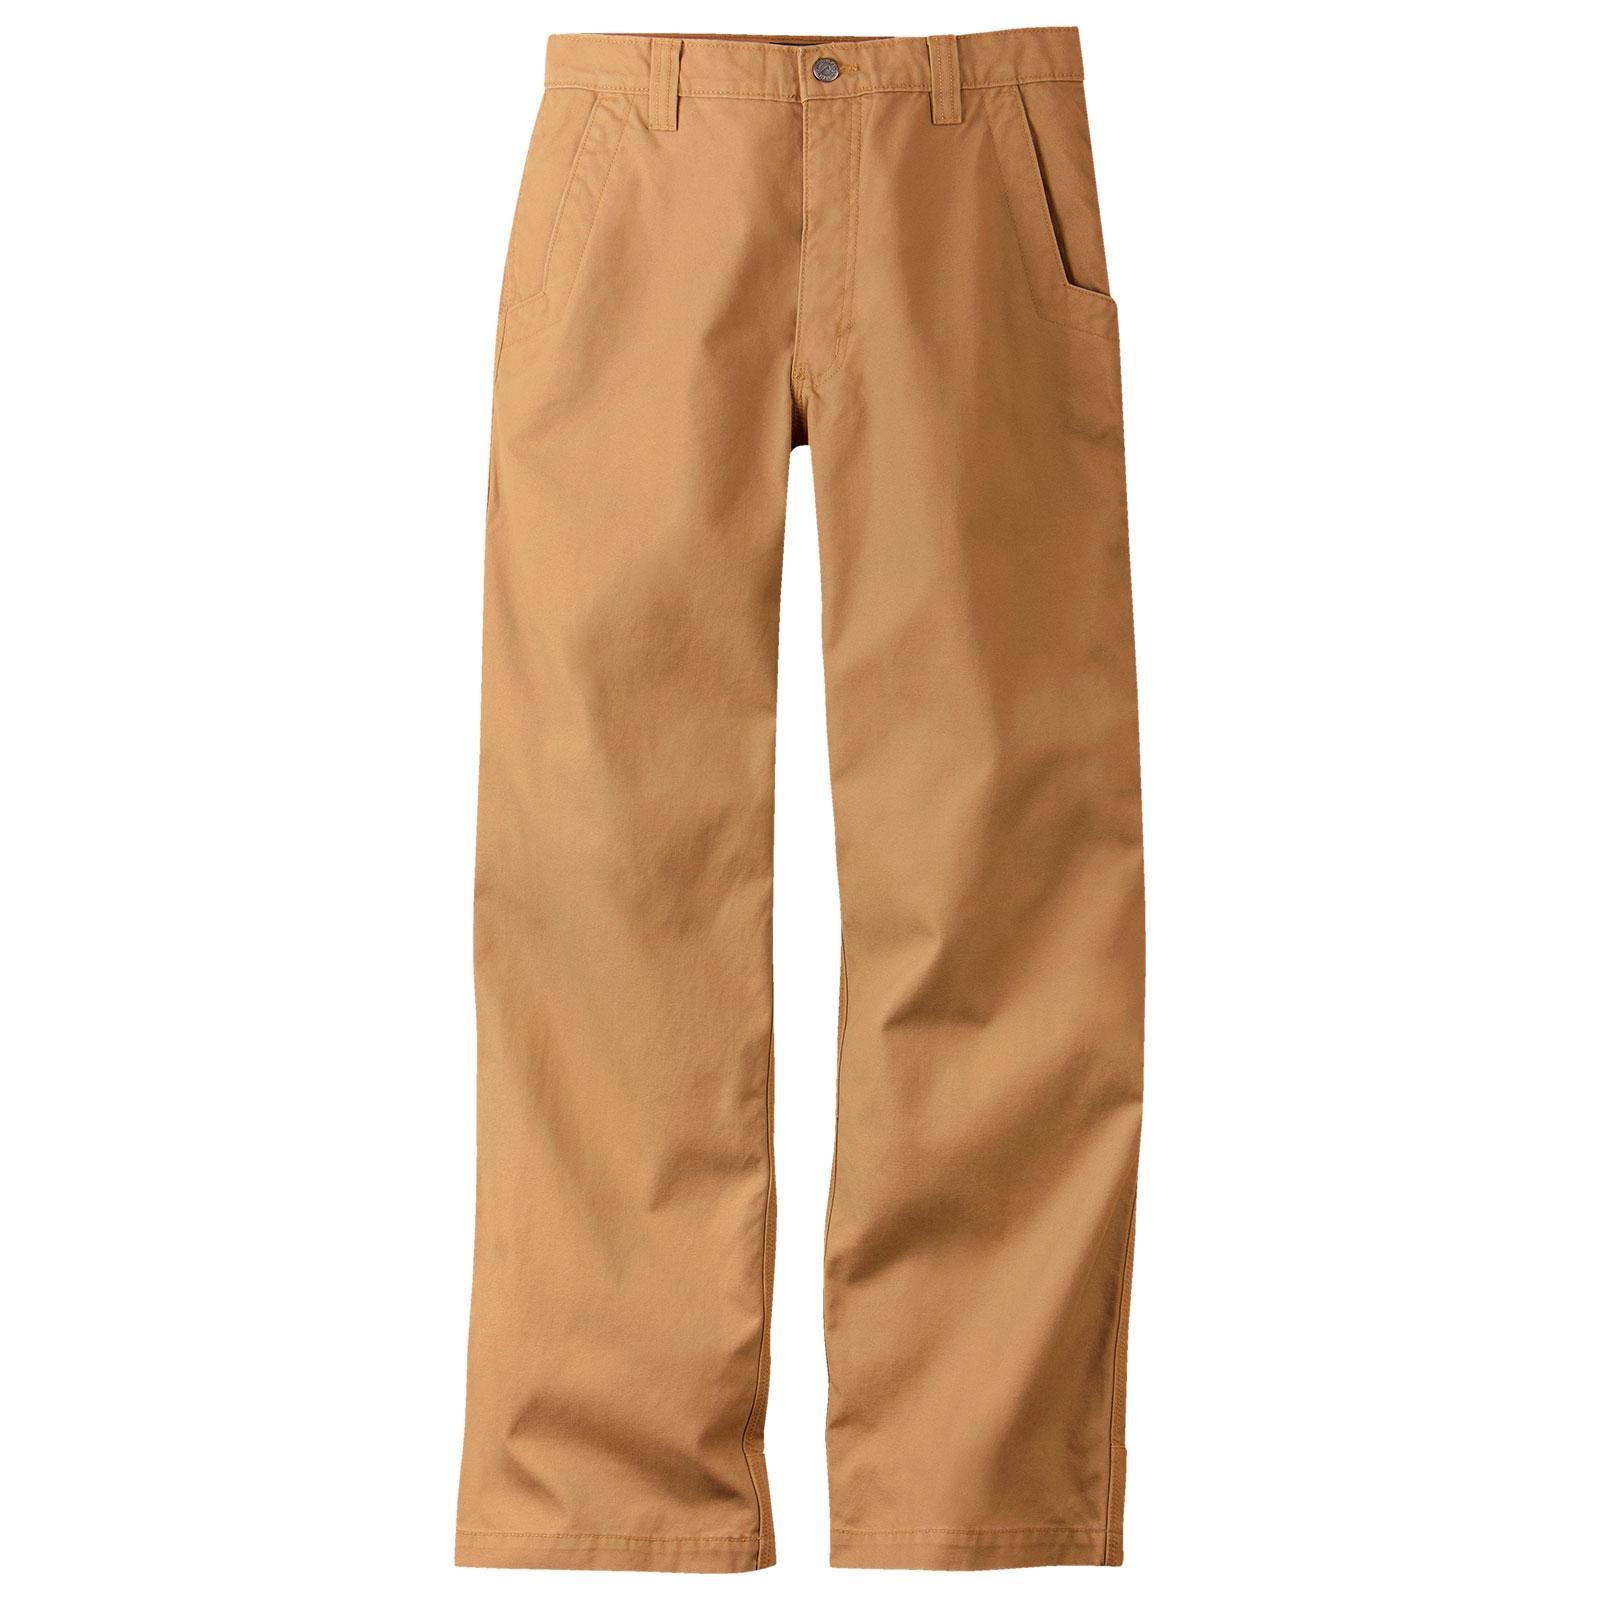 Mountain Khakis – Khaki Pants & Outdoor Clothing Built for the ...